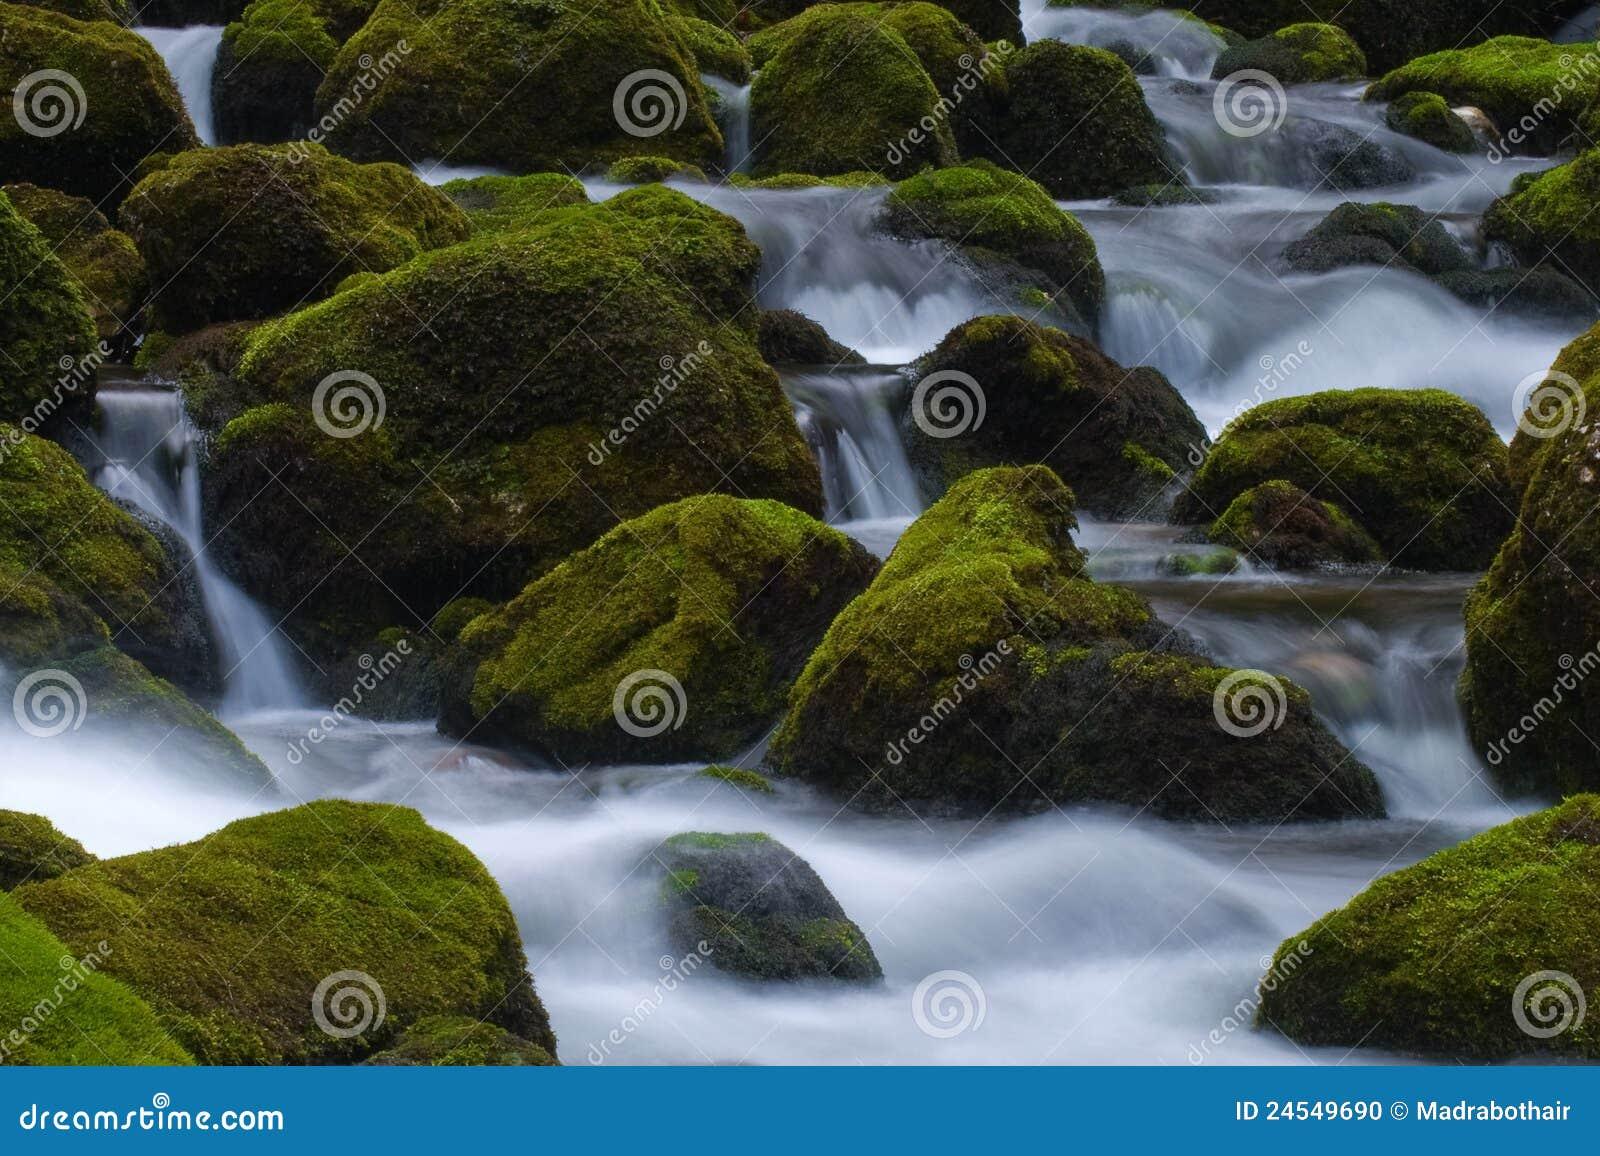 мшистая гора трясет поток